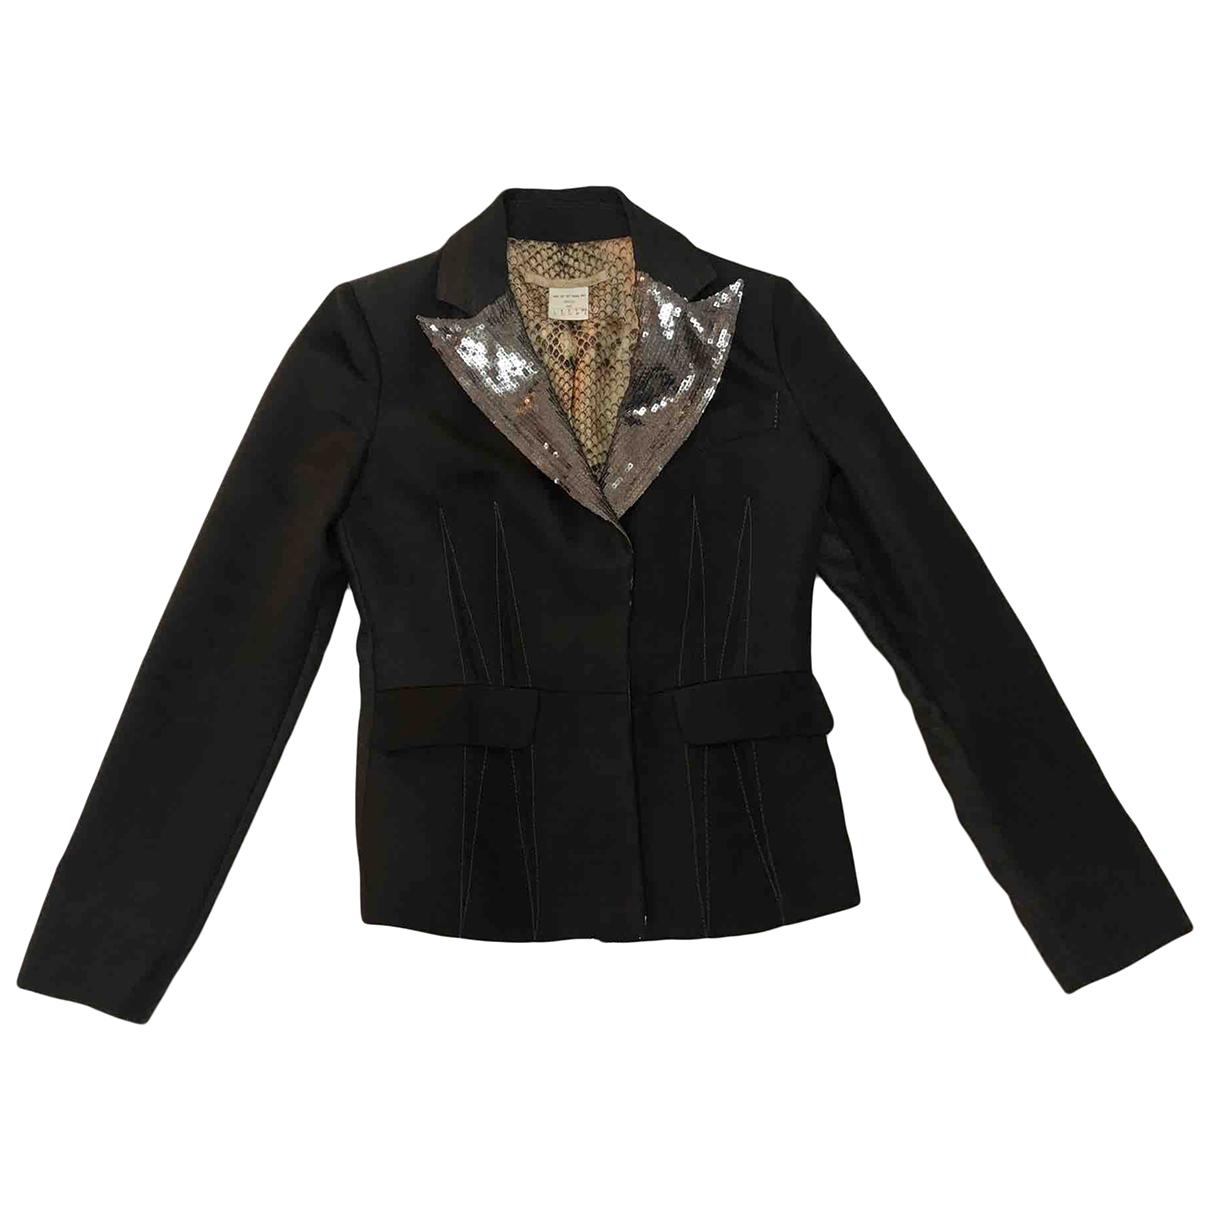 Class Cavalli \N Grey jacket for Women S International